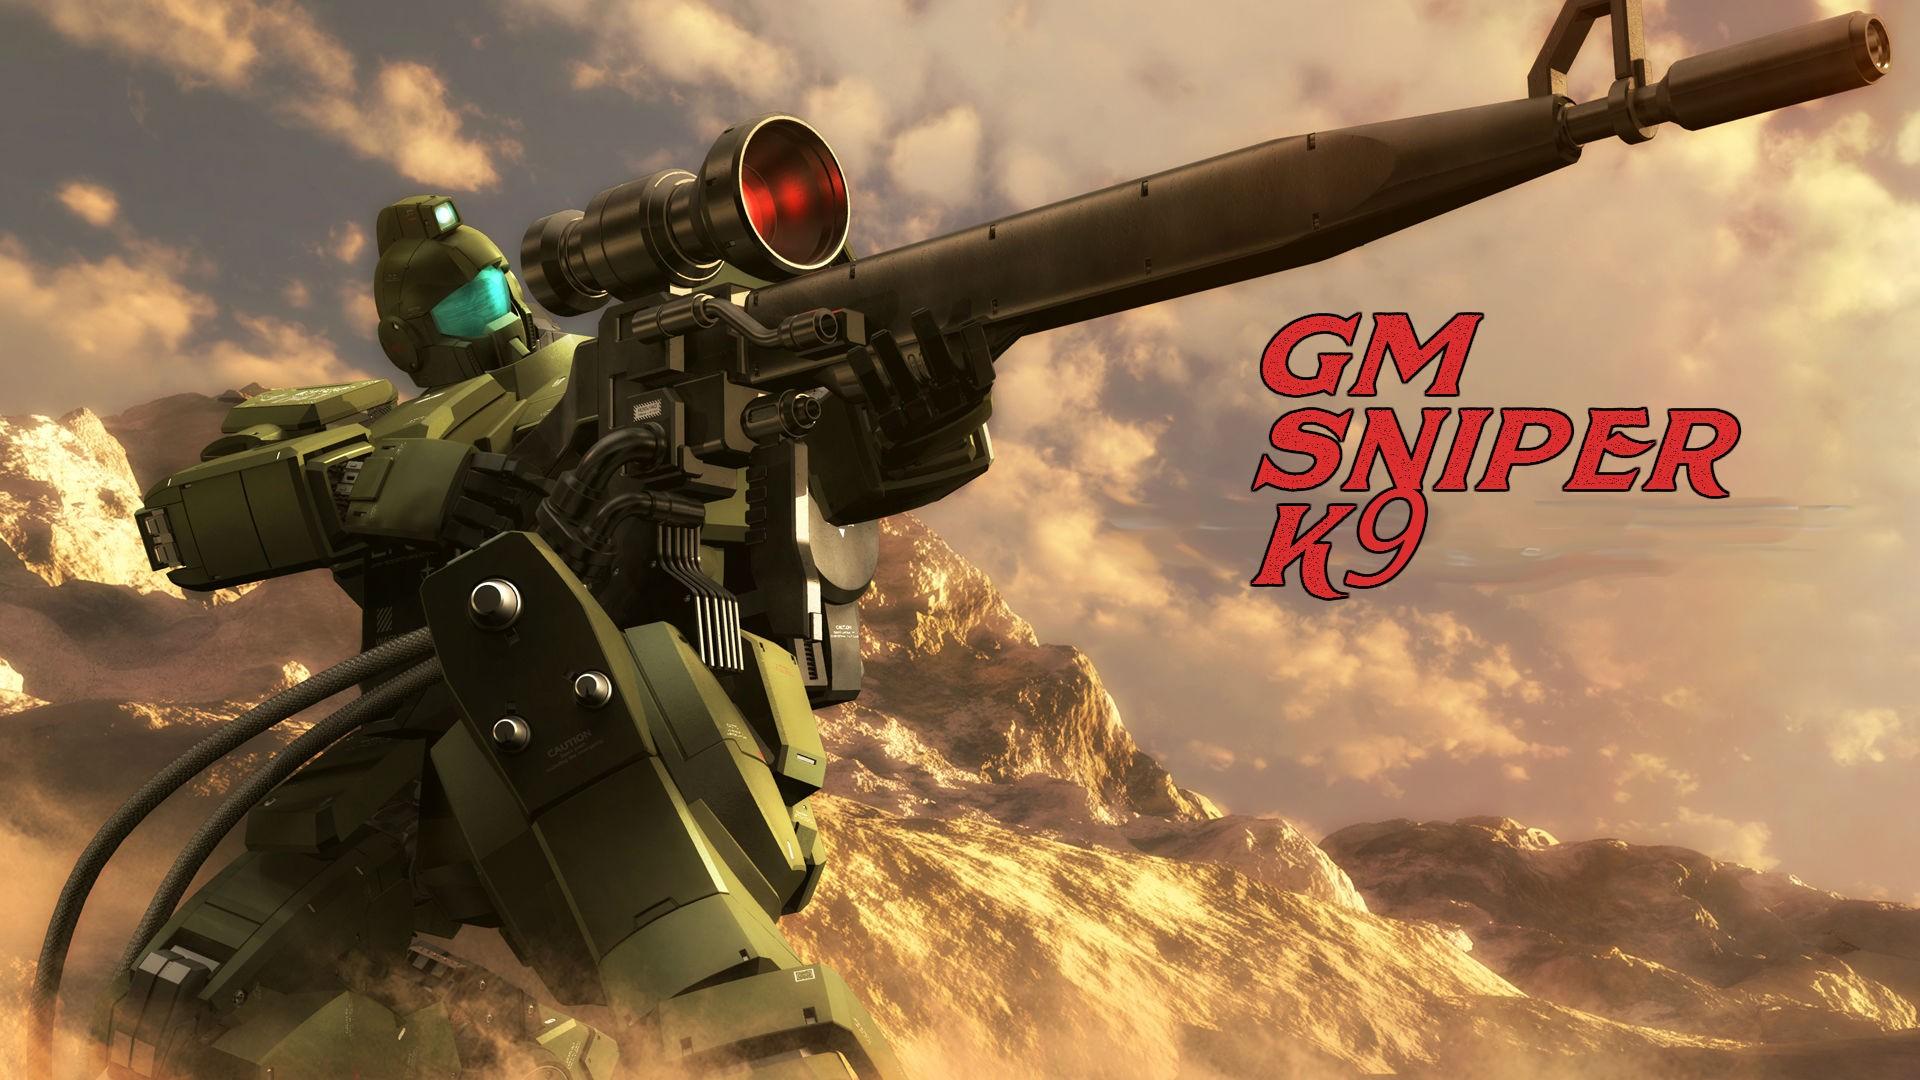 Weapon Soldier Mech Sniper Rifle Marksman Mobile Suit Gundam 0083 Stardust Memory Screenshot 1920x1080